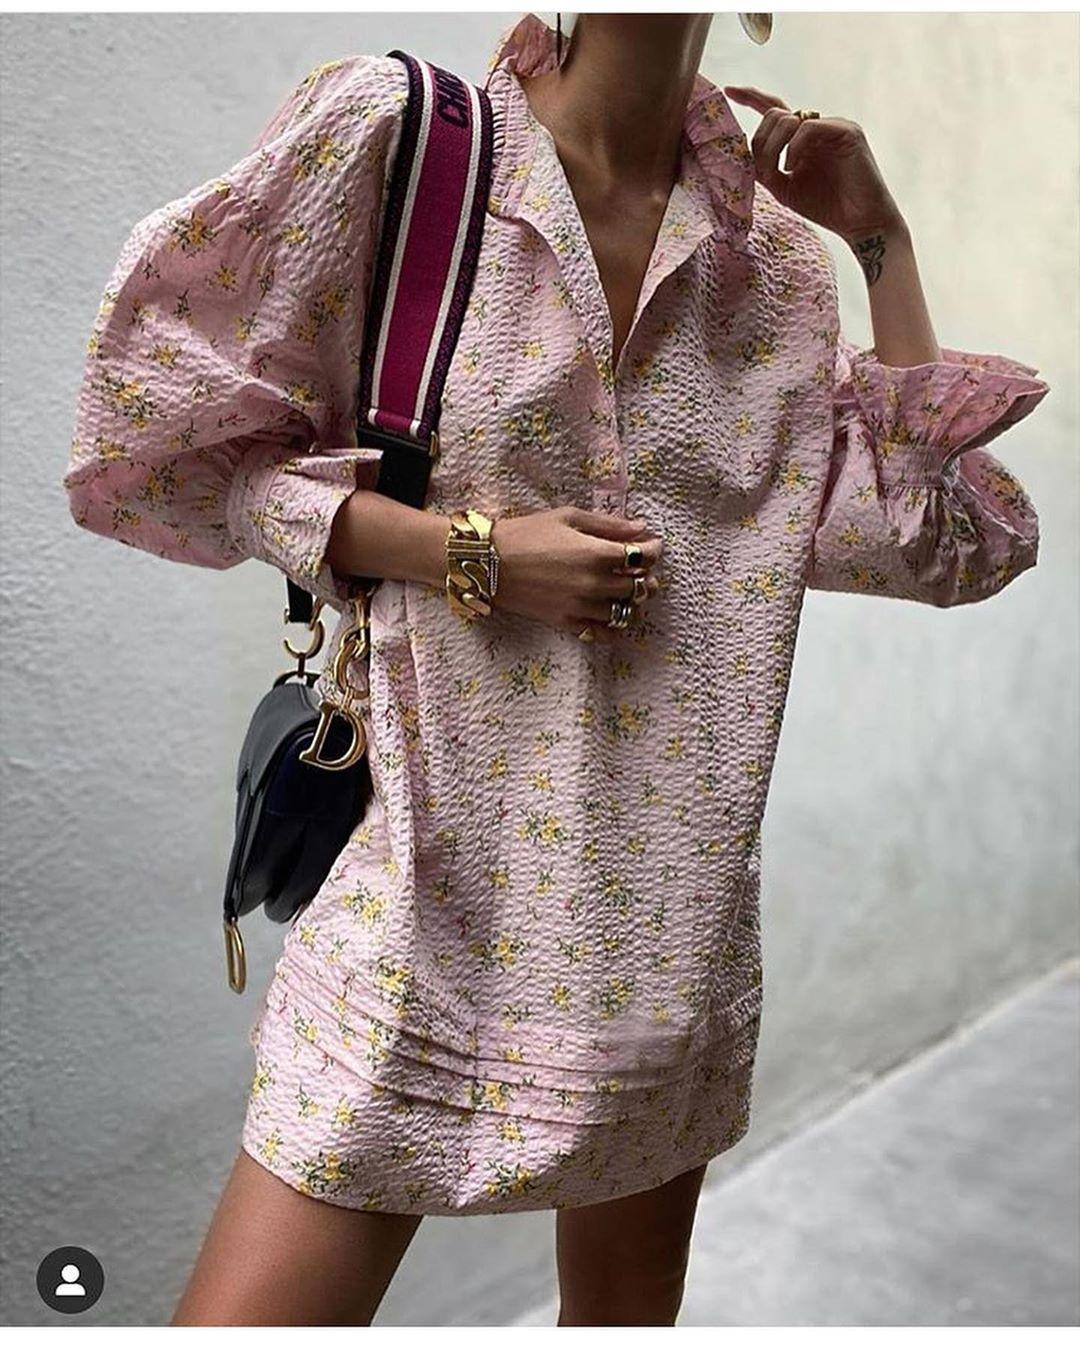 printed shirt dress de Zara sur look_by_zara_hm